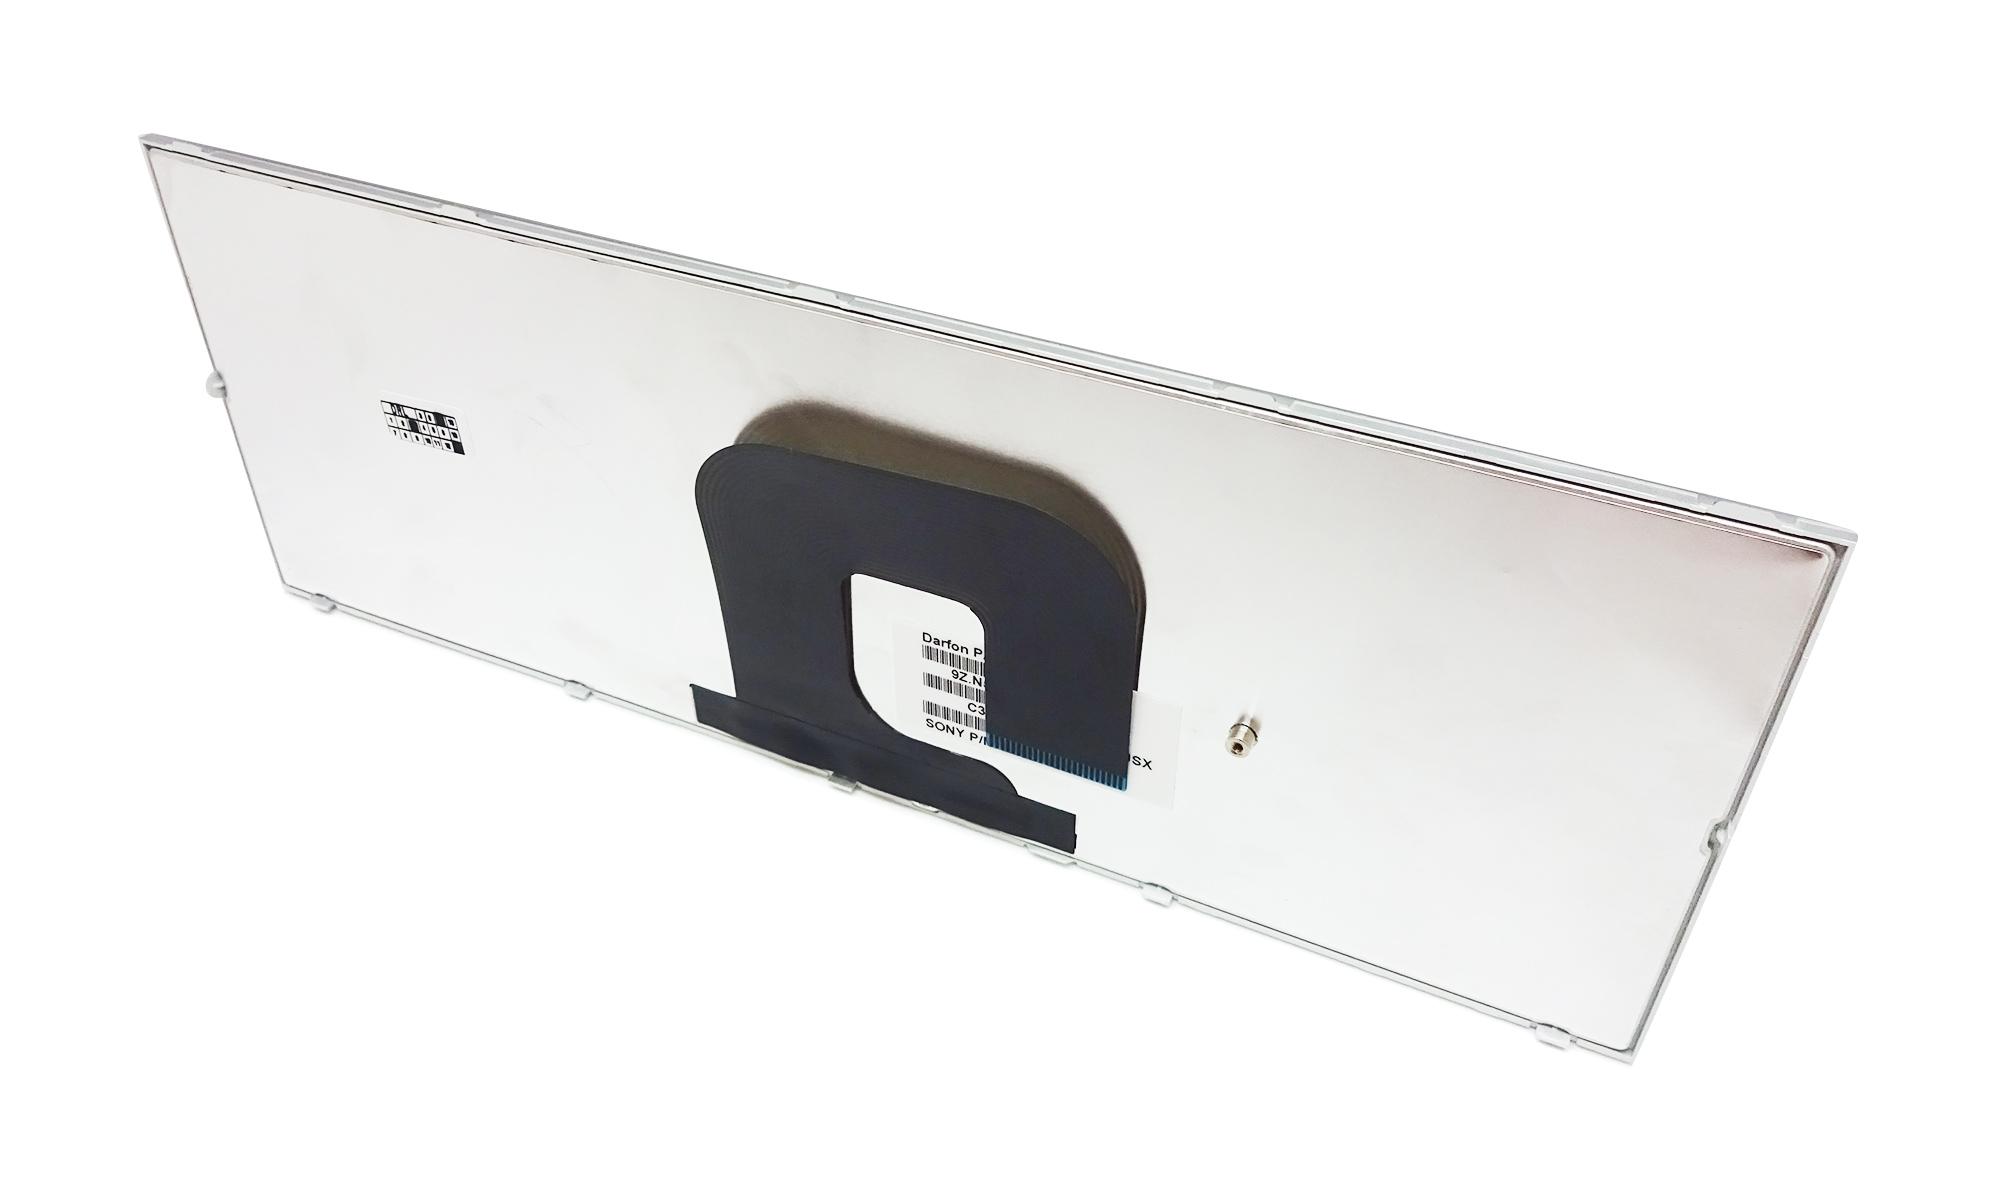 Tastatura originala laptop Sony Vaio, seriile VPCYA si VPCYB, layout US, argintie